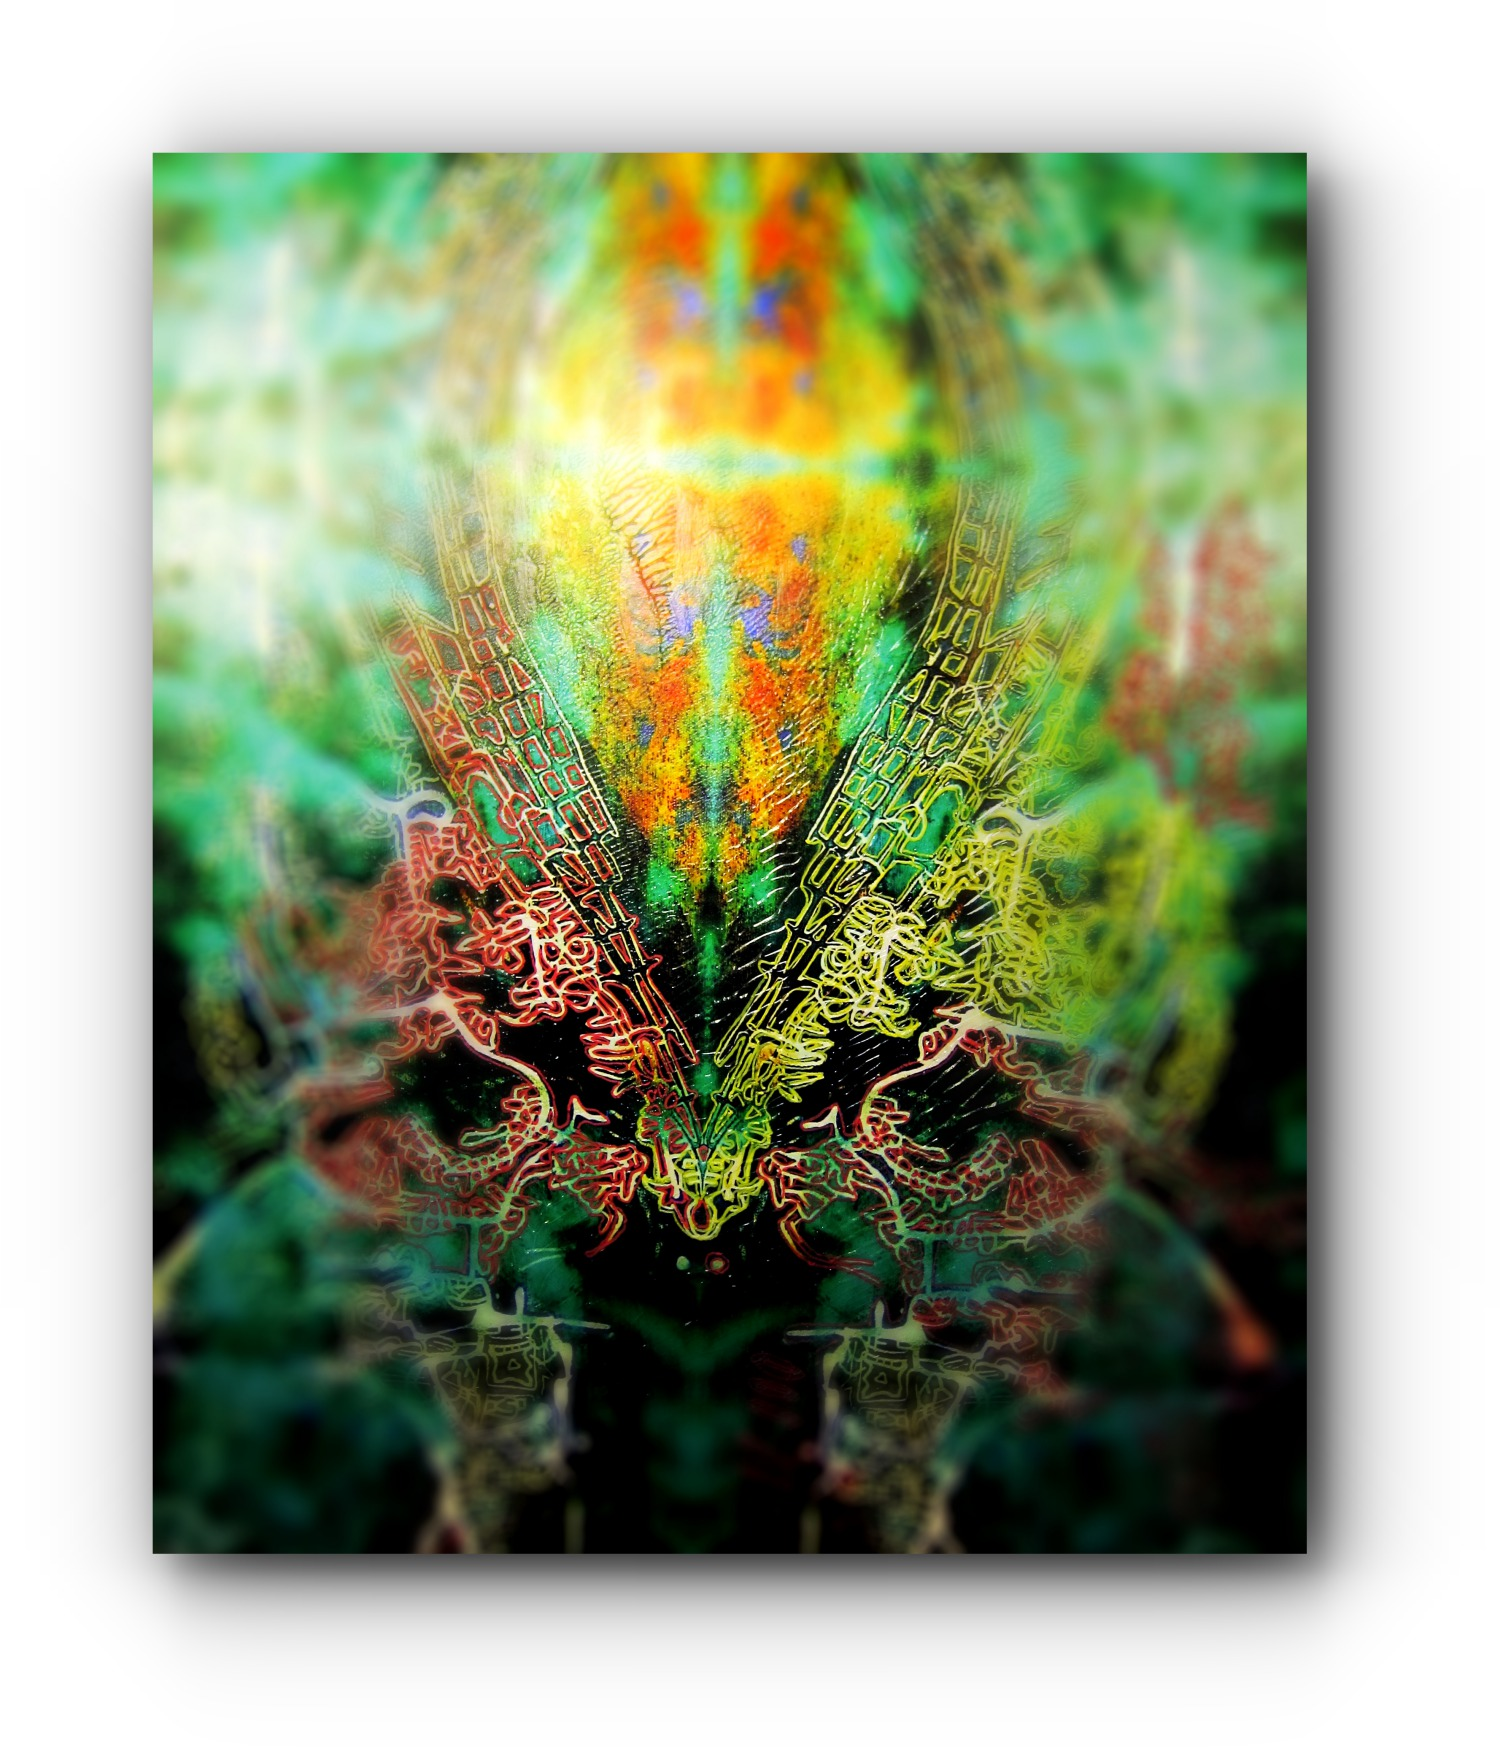 digital-art-nebula-dweller-72-artists-ingress-vortices.jpg